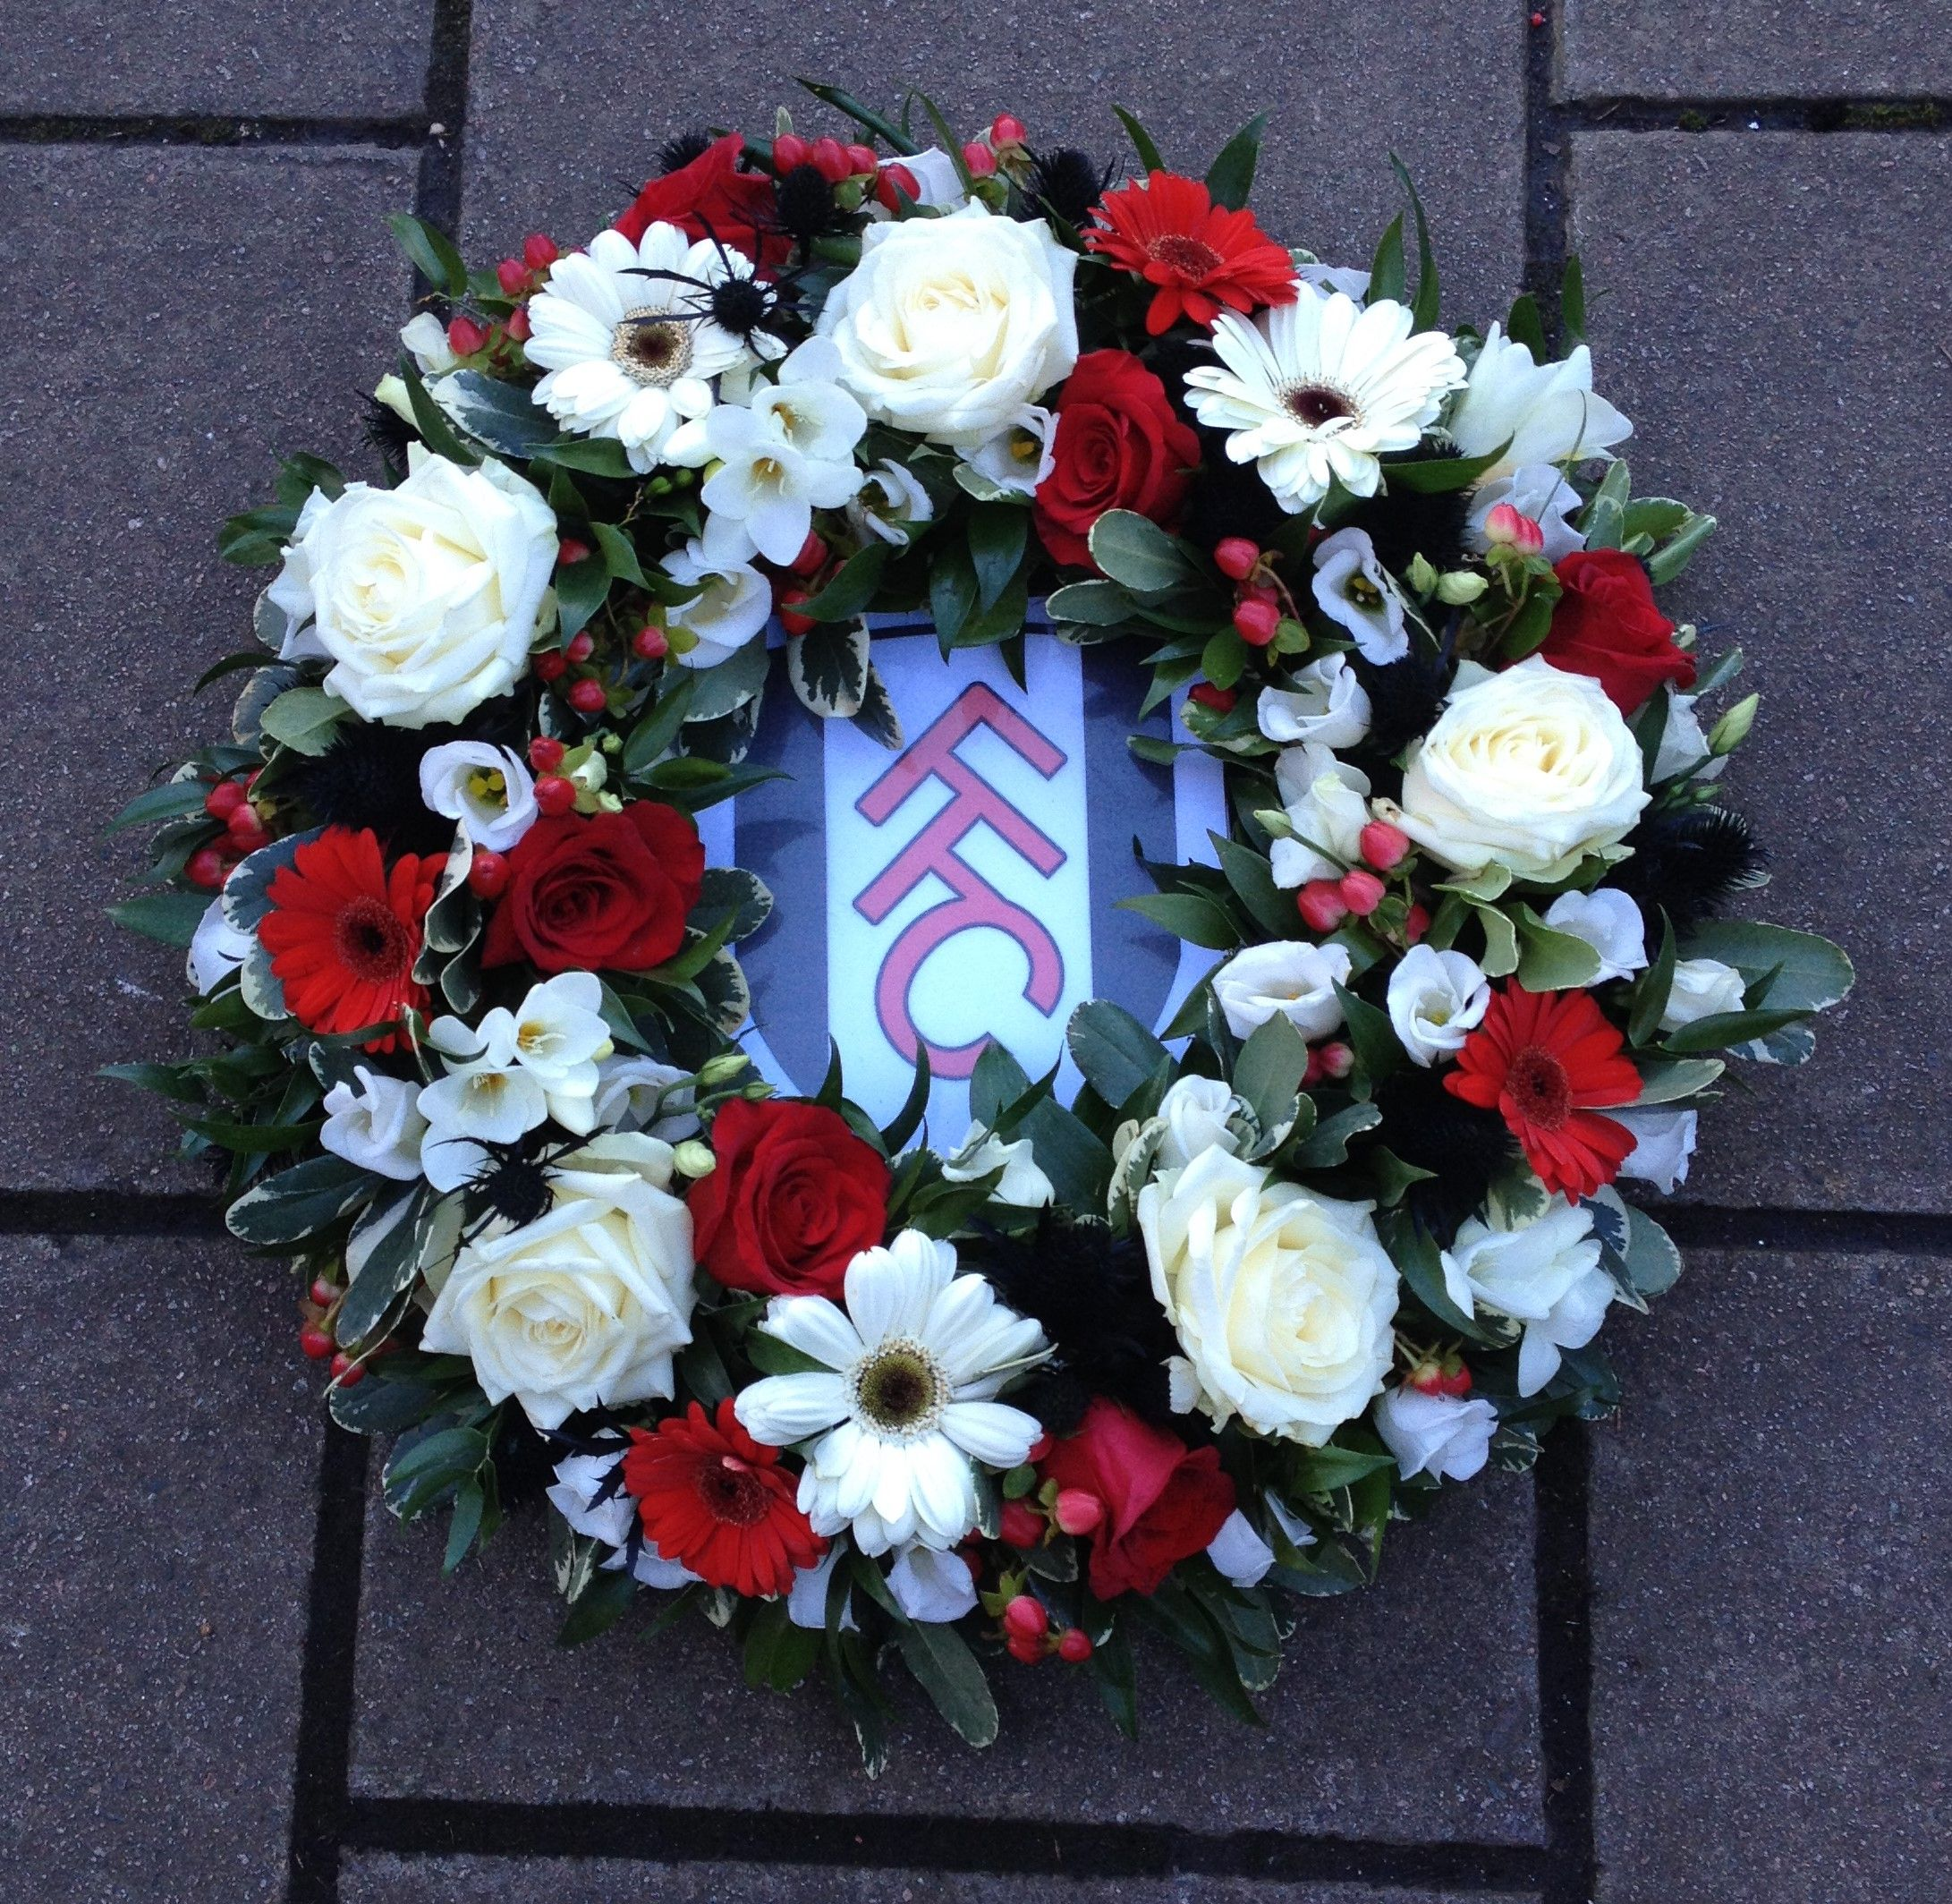 Fulham football club wreath a bespoke floral funeral tribute fulham football club wreath a bespoke floral funeral tribute izmirmasajfo Images